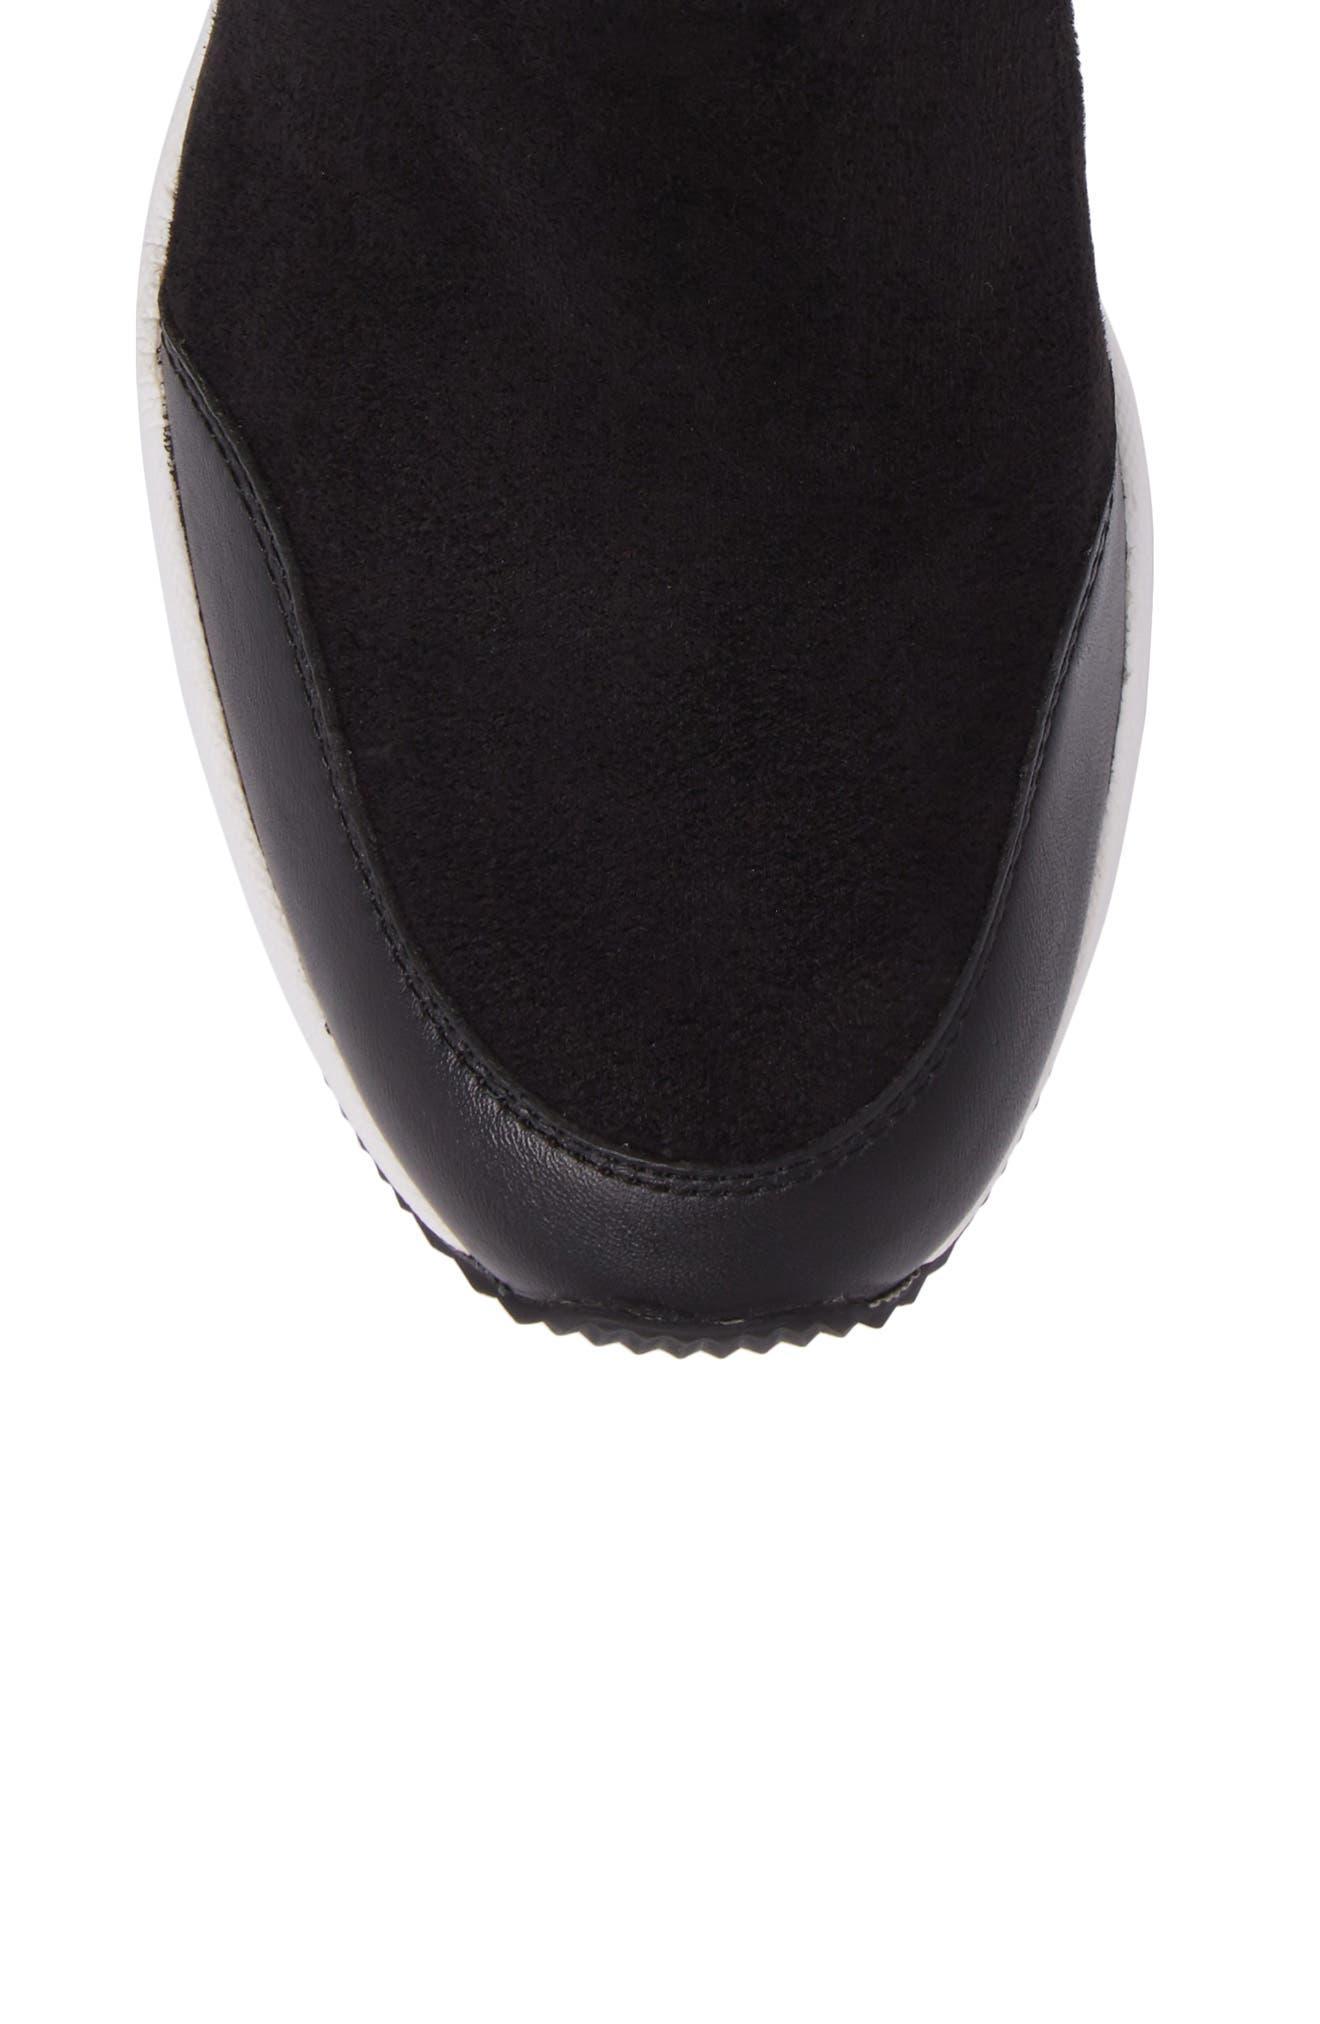 'Ace' Wedge Sneaker Bootie,                             Alternate thumbnail 5, color,                             BLACK SUEDE